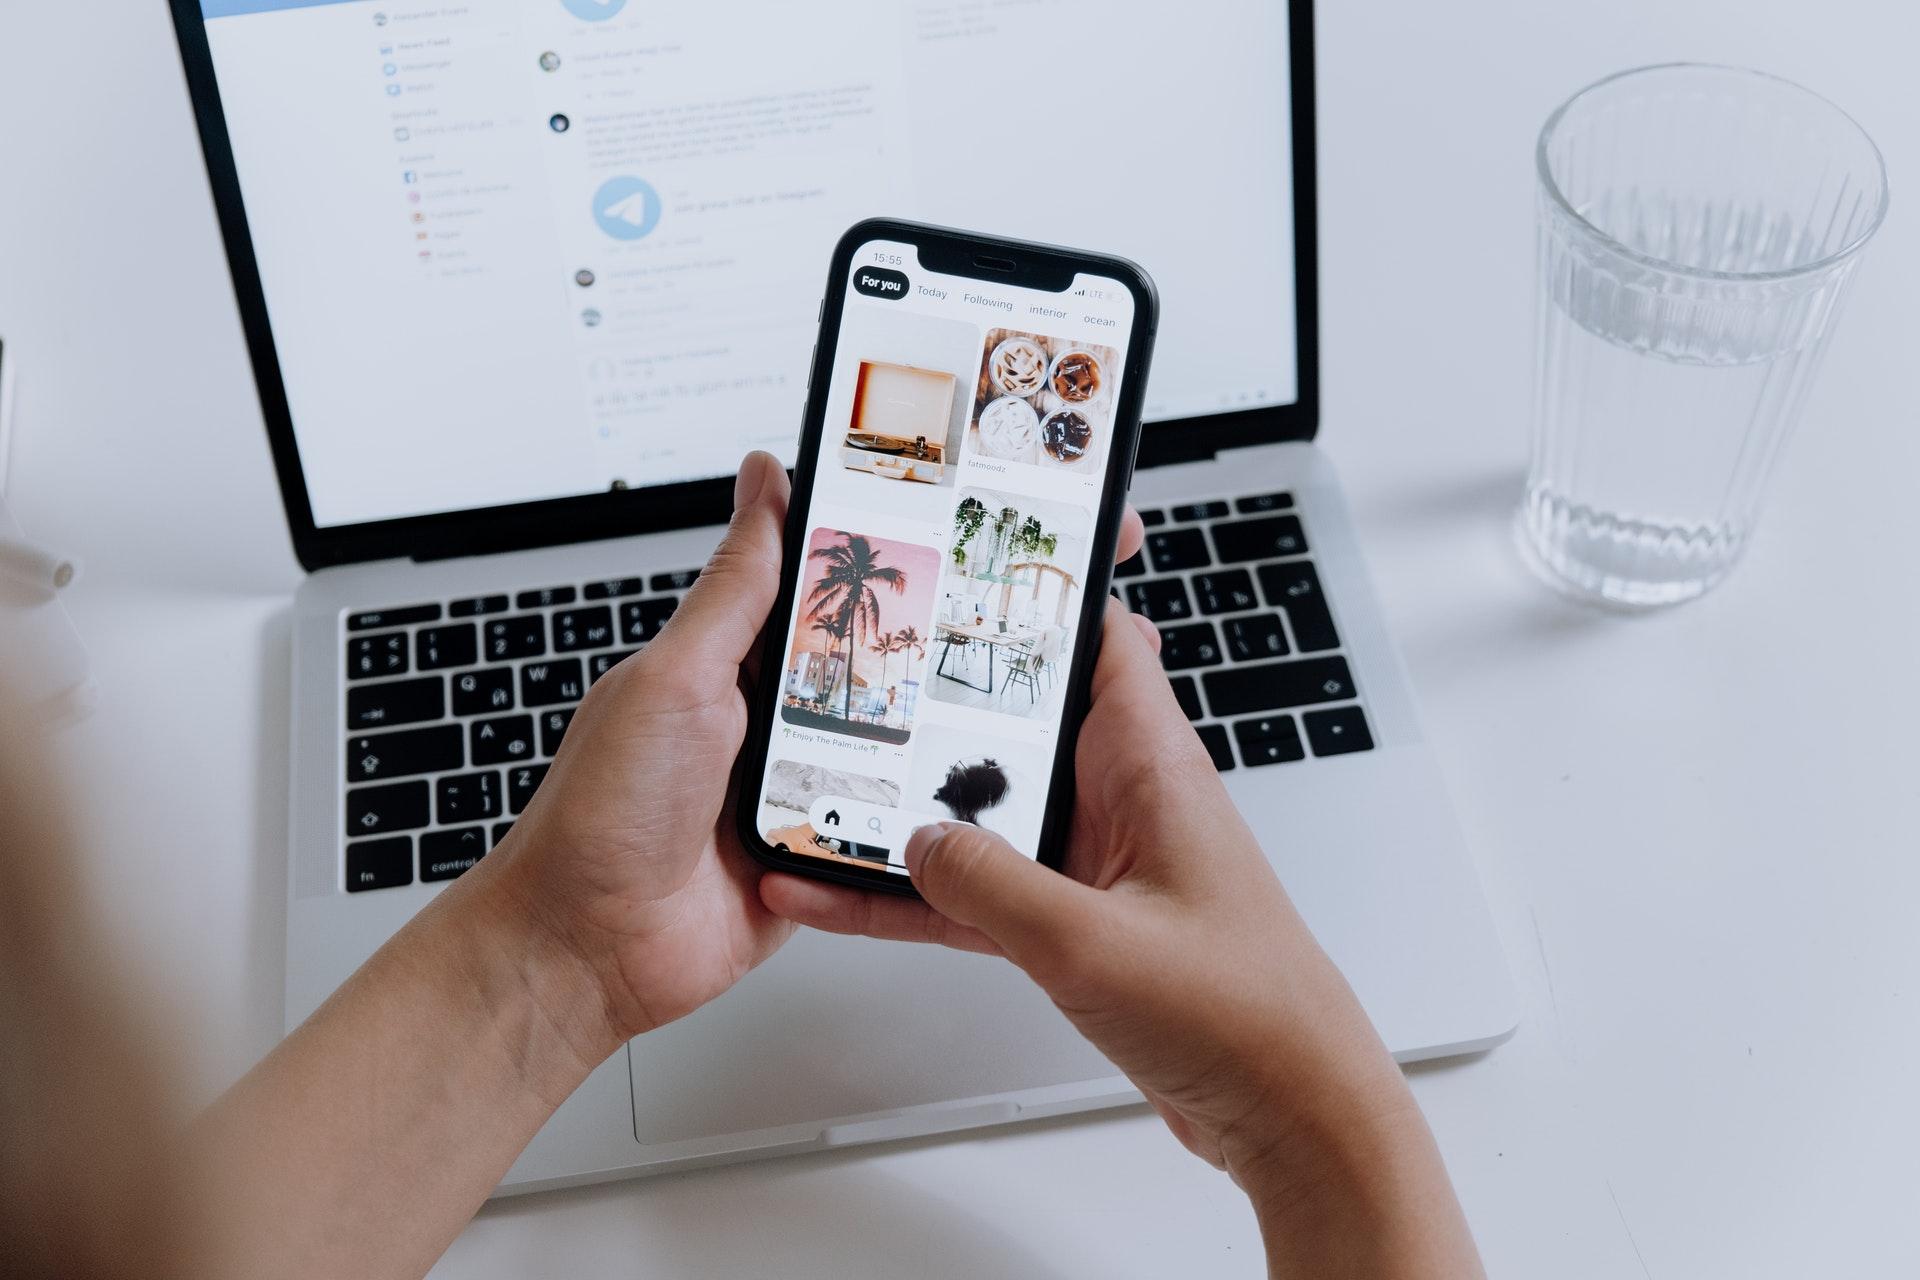 The Best Tech News of Summer – The iPhone 12